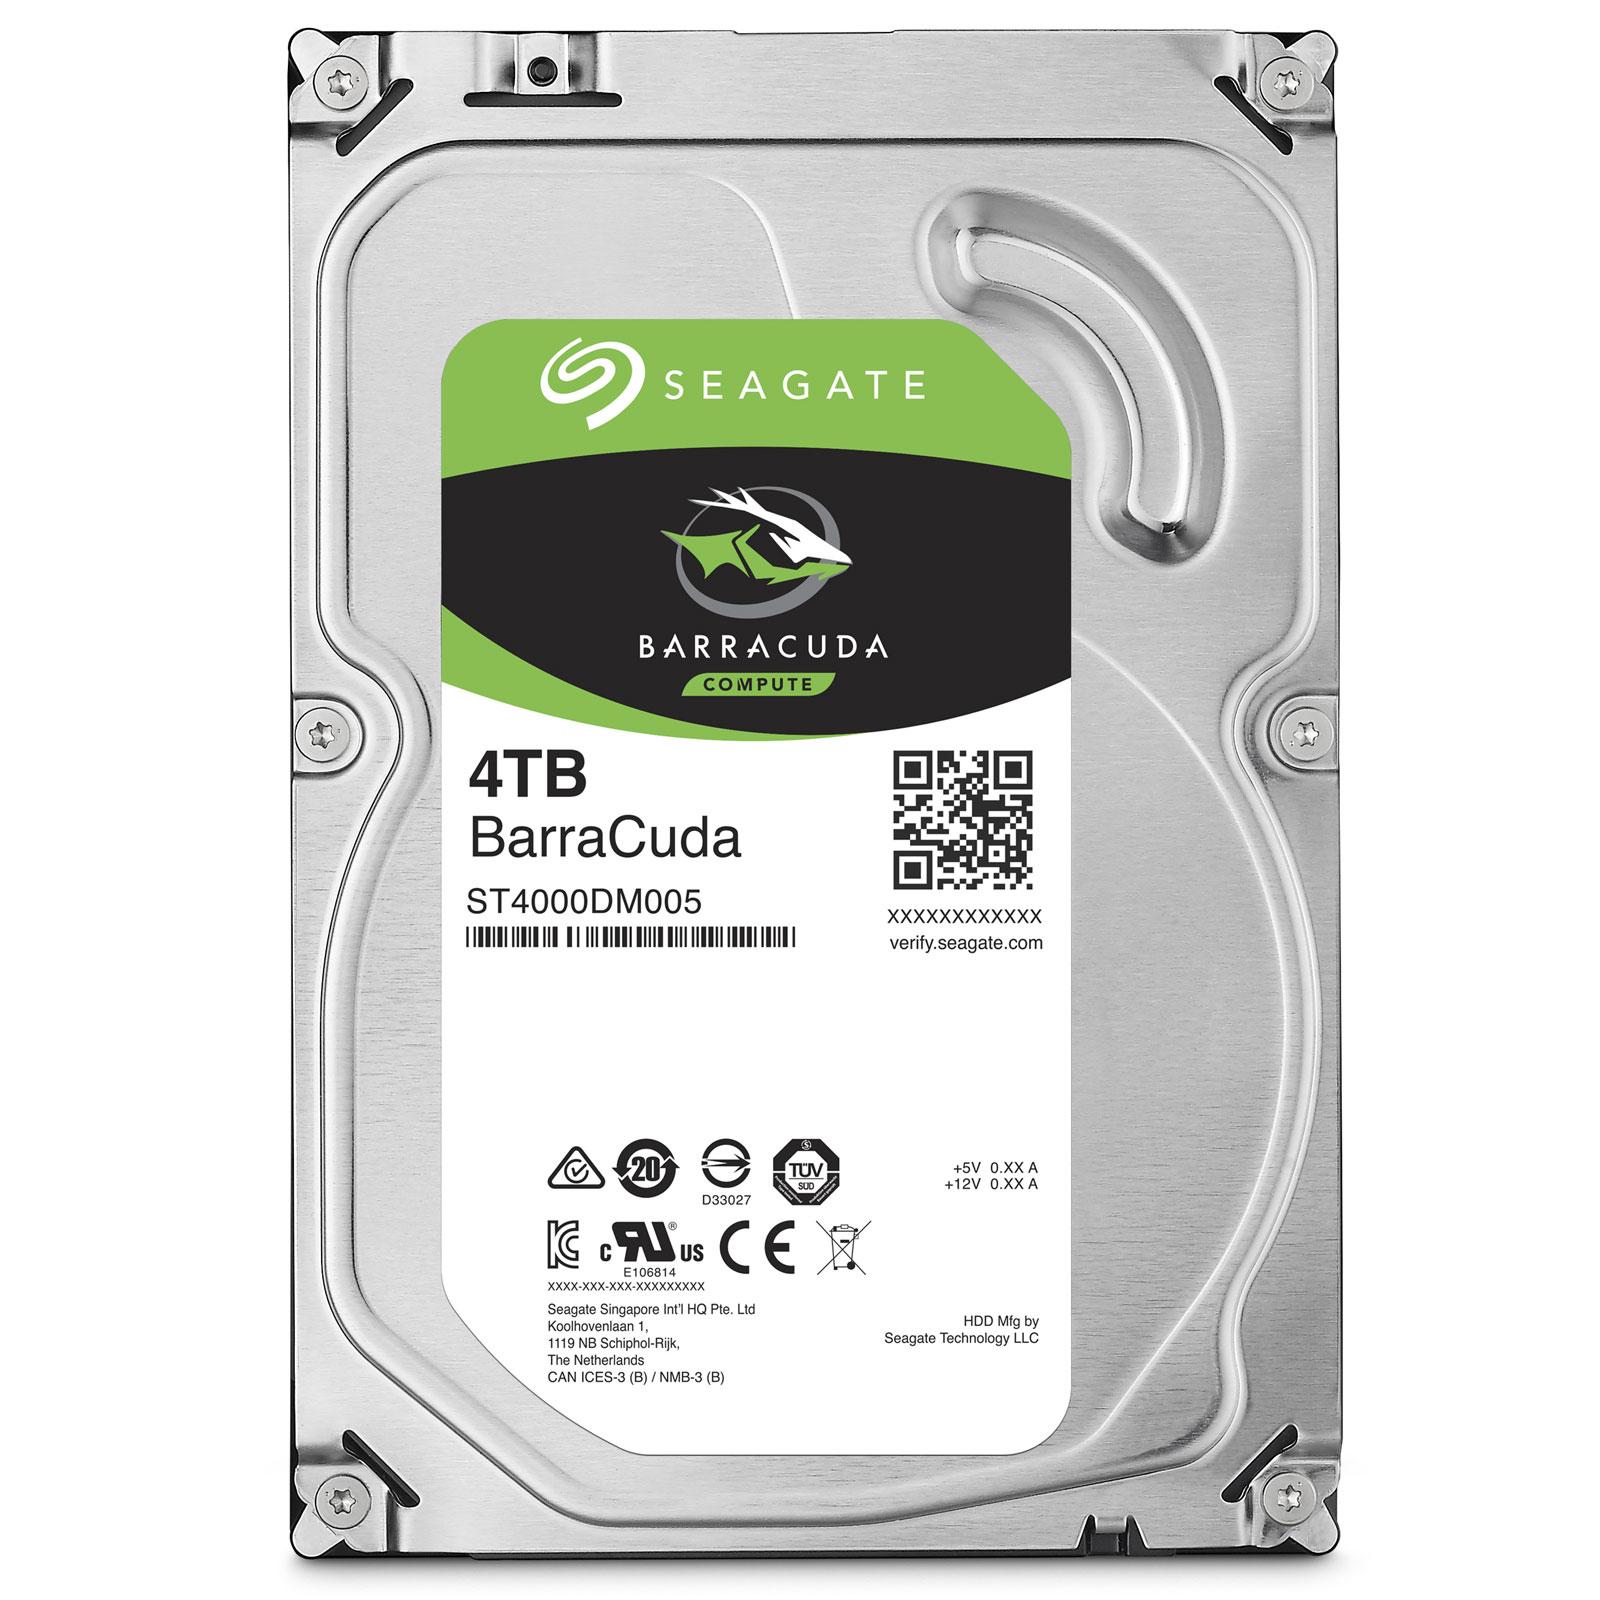 "Seagate BarraCuda 3.5"" HDD, 4TB, 3.5"", SATAIII, 64MB cache, 7.200RPM"